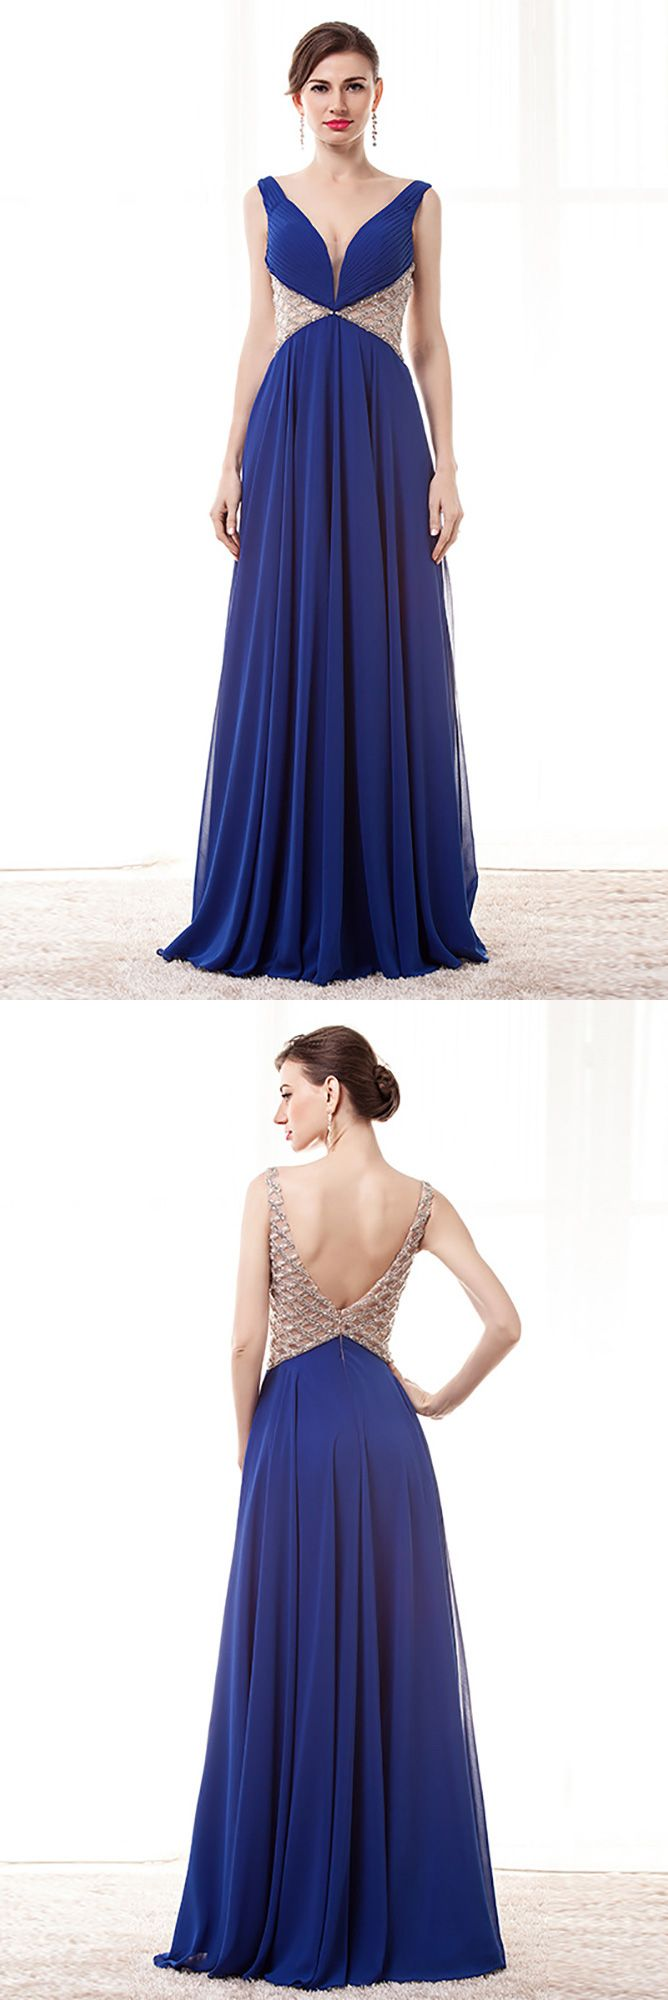 Open back vneck blue prom dress long with beading waist straps